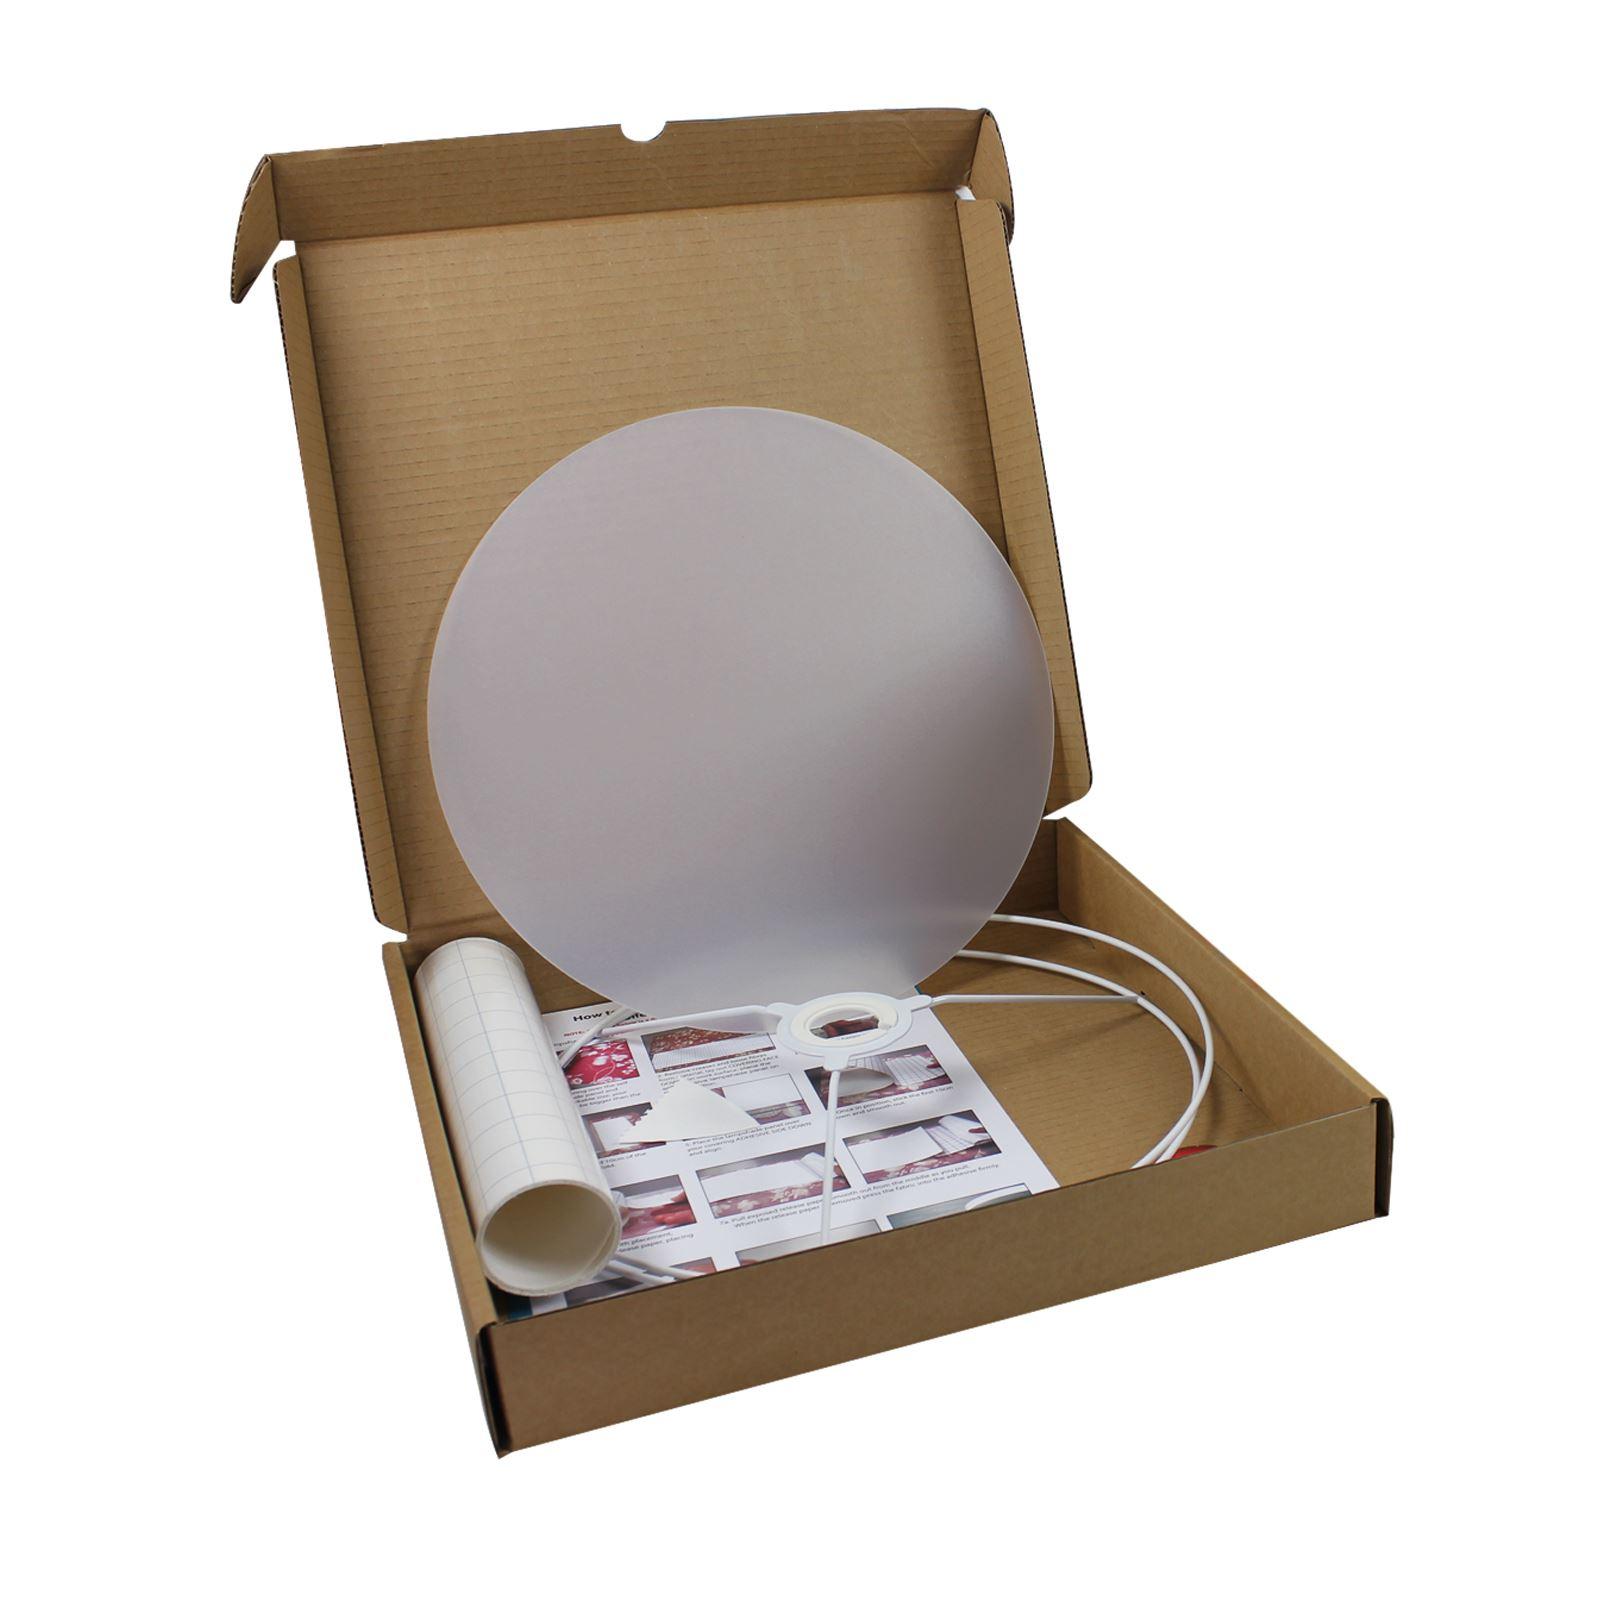 Haz-tu-propia-pantalla-diametro-30cm-KIT-de-Hagalo-usted-mismo-pantalla-haciendo-por-needcraft miniatura 7